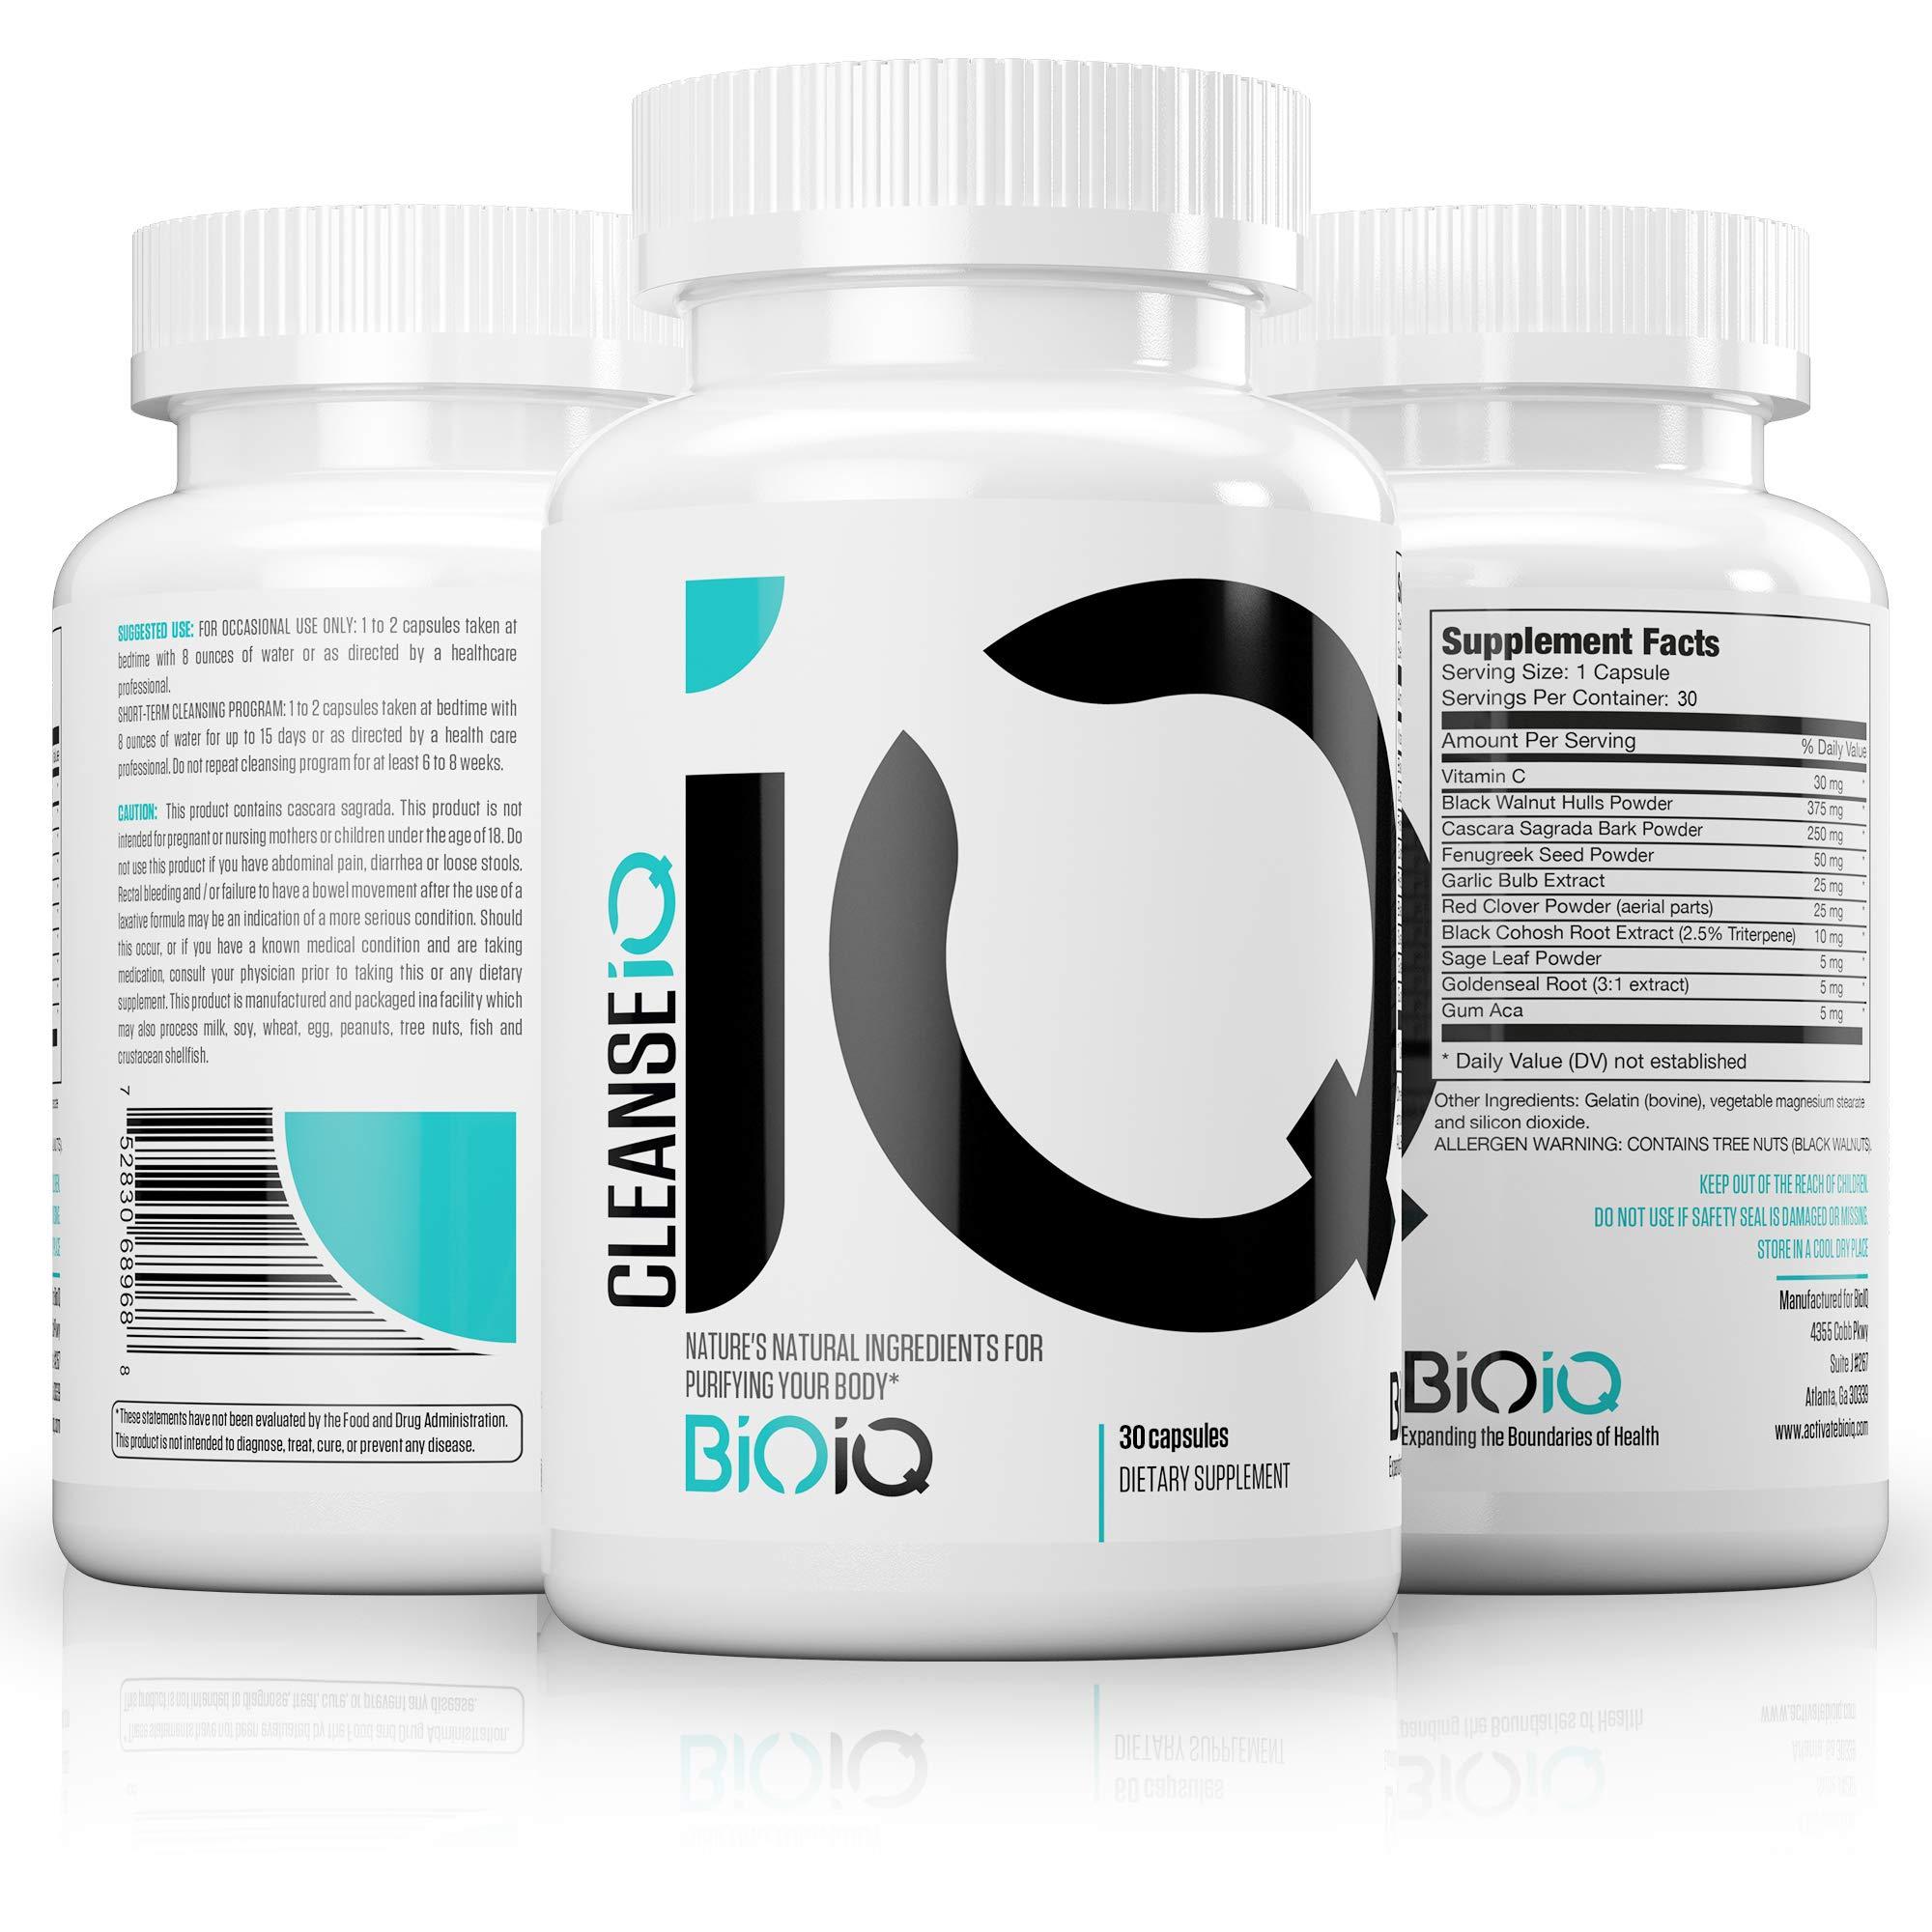 BioIQ Natural Colon Cleanse Detox – 15 Day Cleanse – Herbal Formula: Black Walnut Hull, Cascara Sagrada, Fenugreek, Black Cohosh – GMO Free, USA Supplement - Best Cleanse for Weight Loss